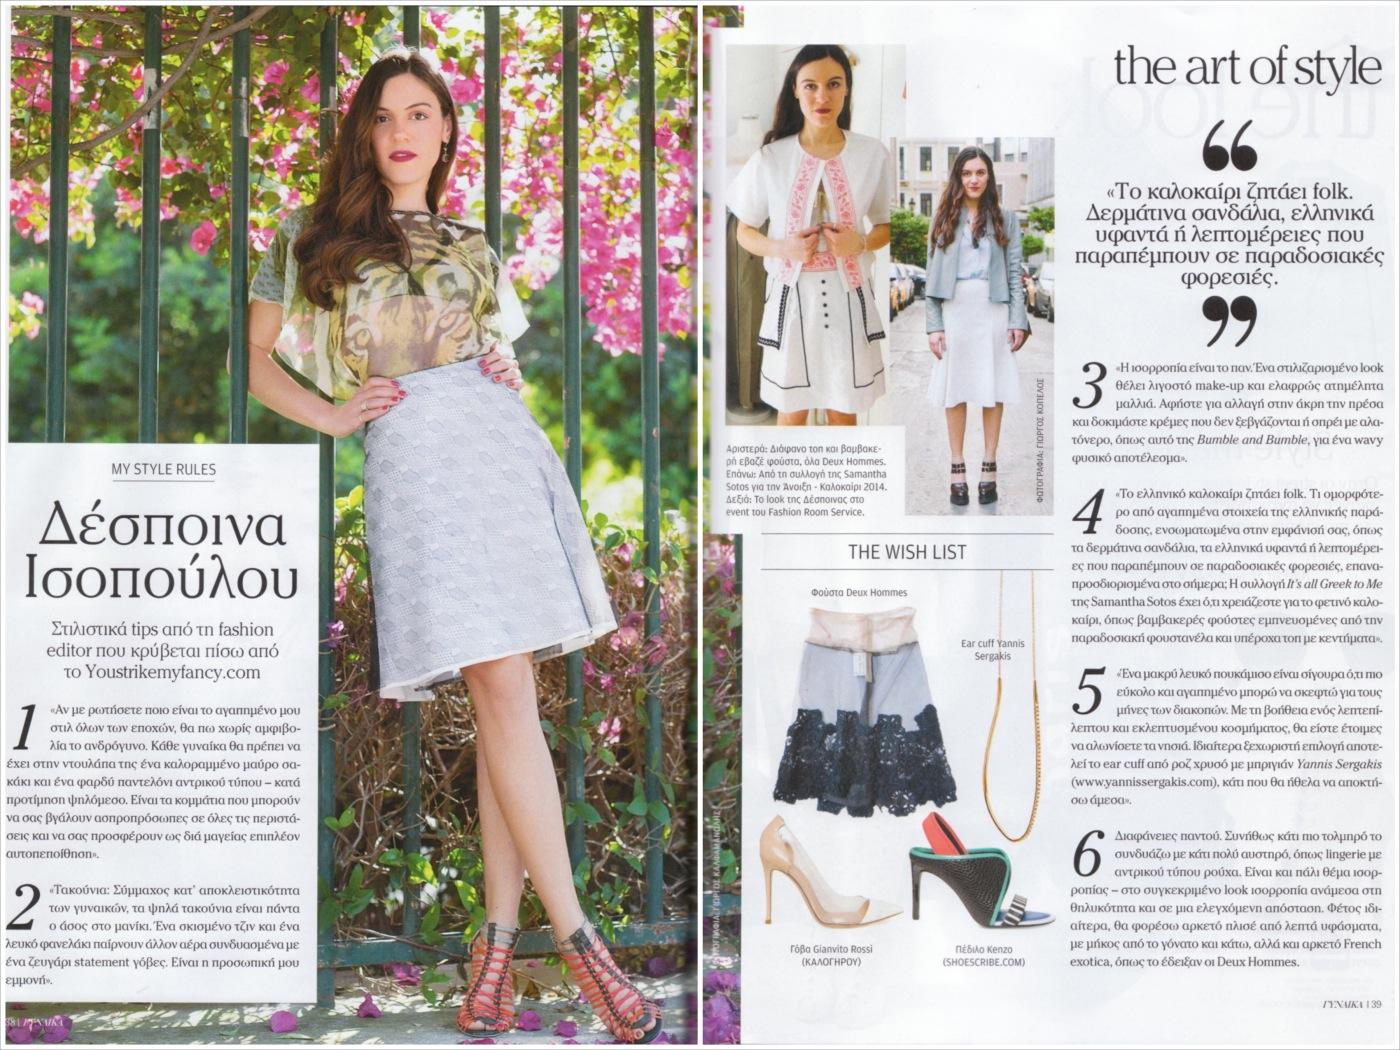 ysmf.despina.isopoulou.gynaika.magazine.July.2014